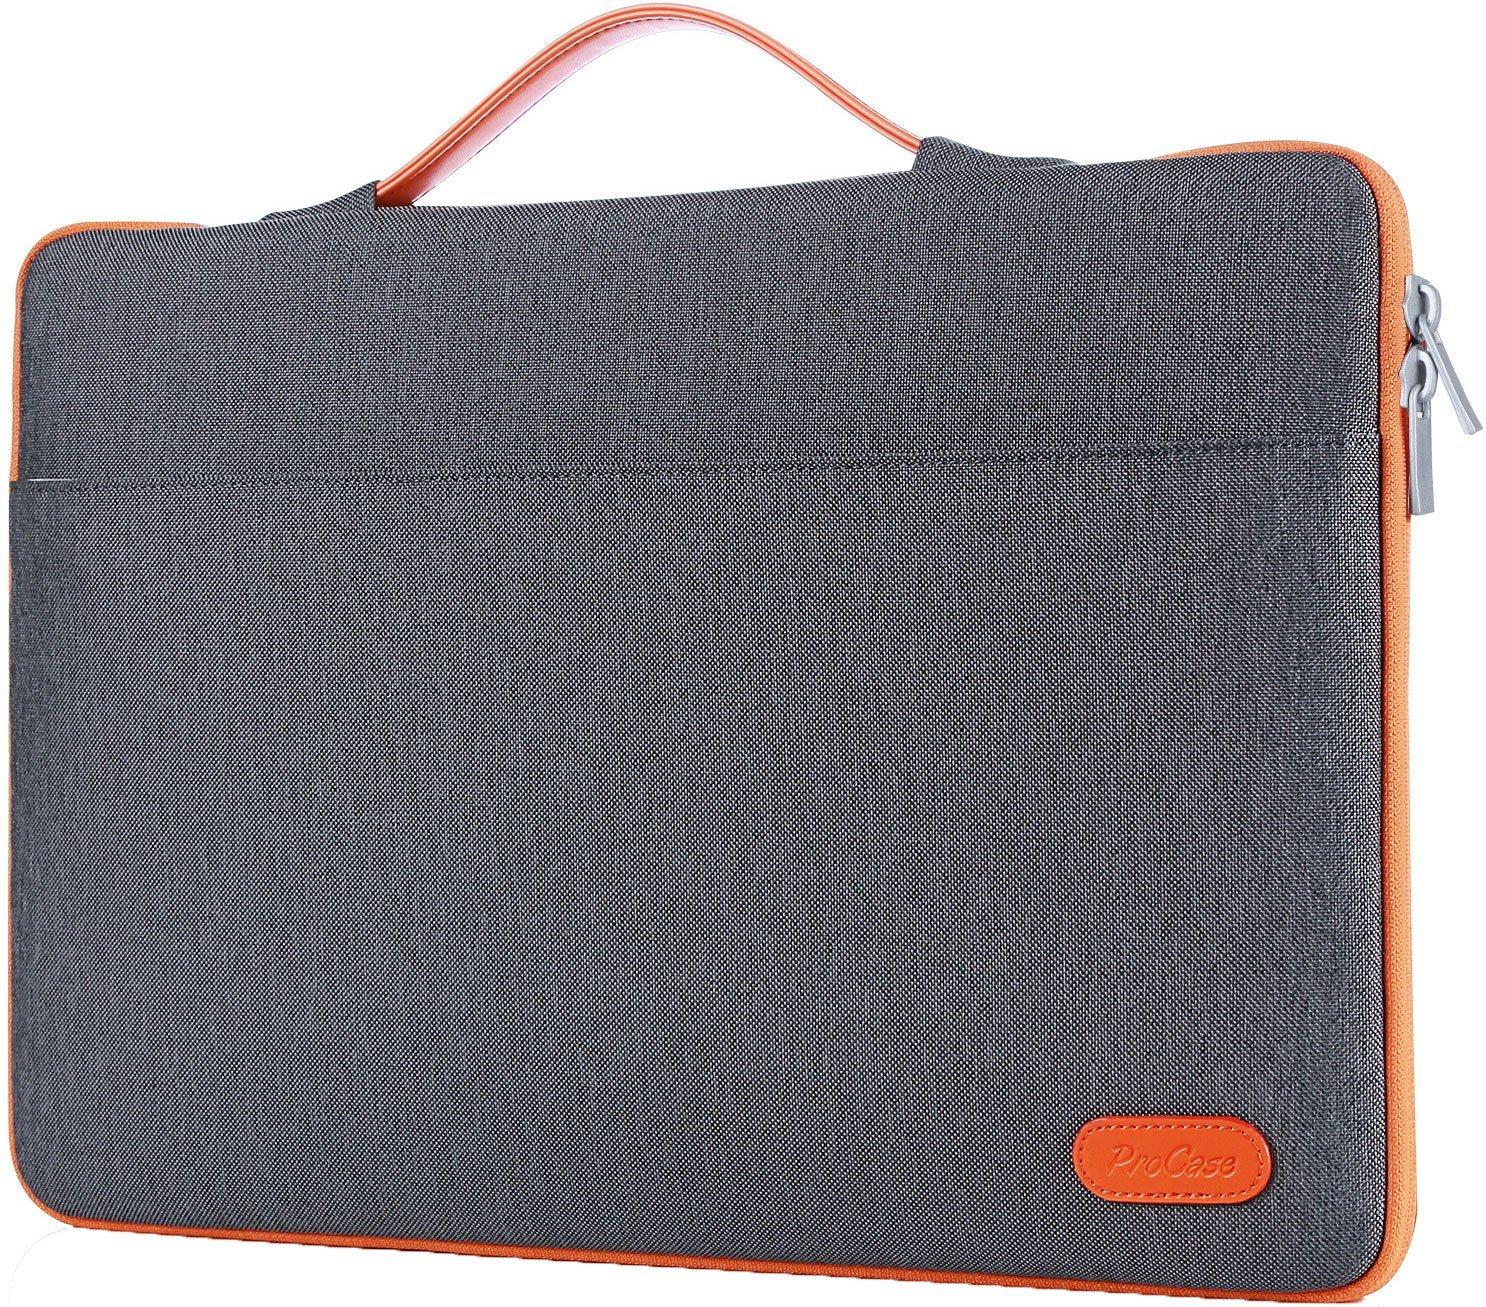 Procase Laptops 15 Inches Macbook Pro Laptop Briefcase Sleeve d0c2862c13ecd